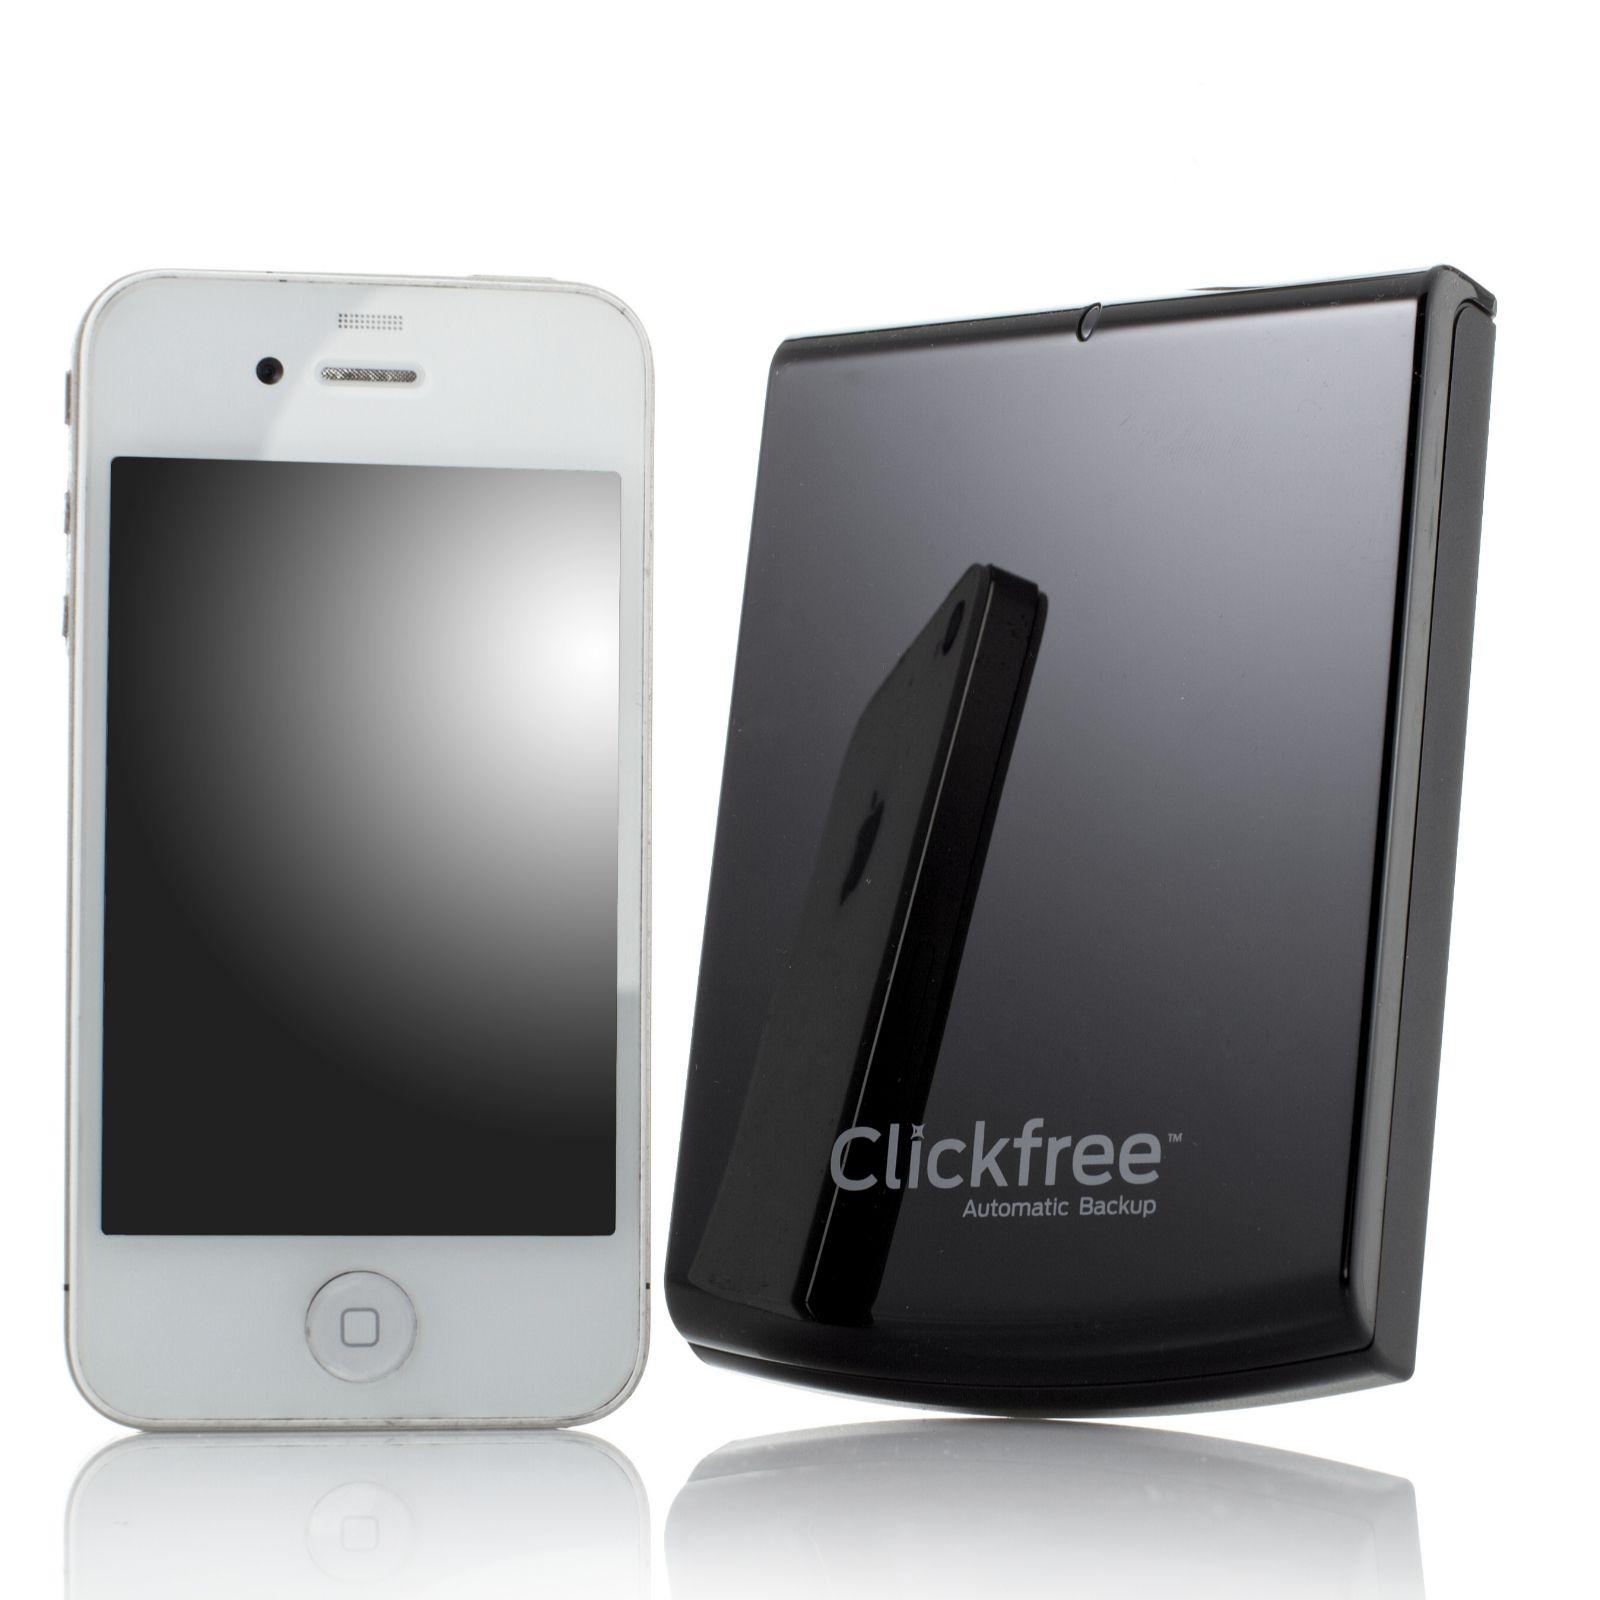 Clickfree C6 750GB File & Software Backup Hard Drive for Multiple PCs &  Gadgets - QVC UK